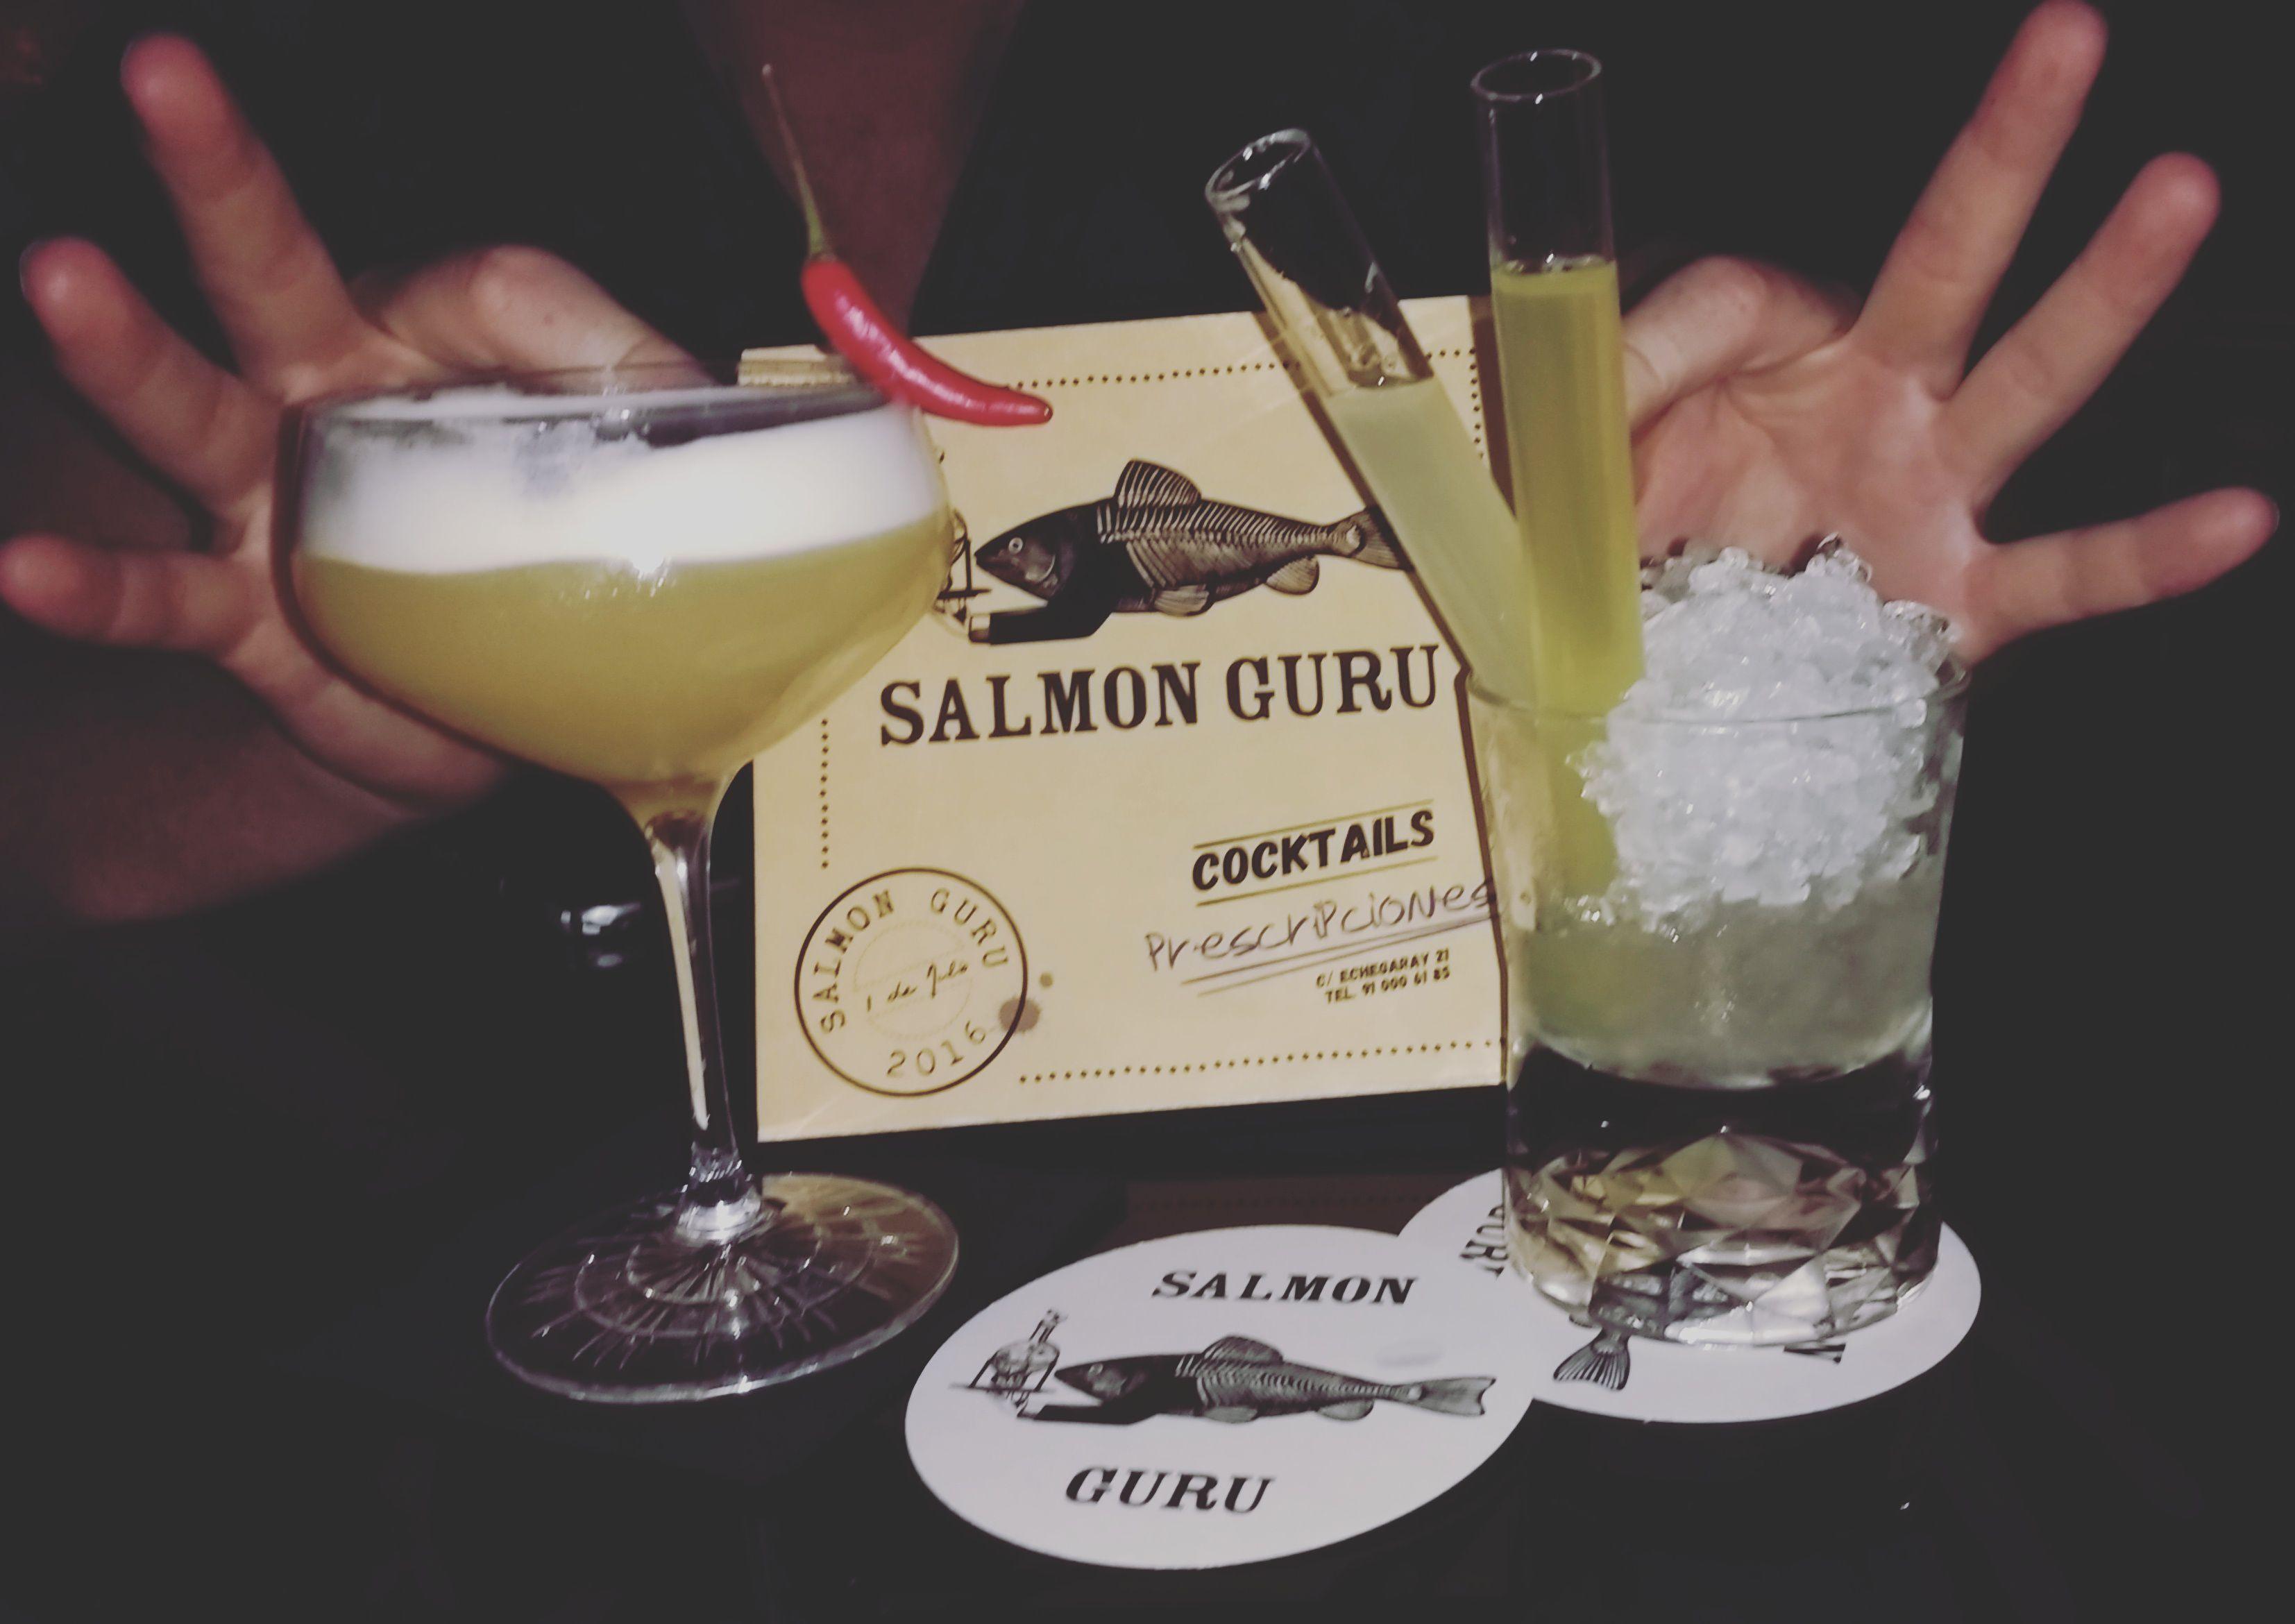 Salmon Guru's Original Cocktails